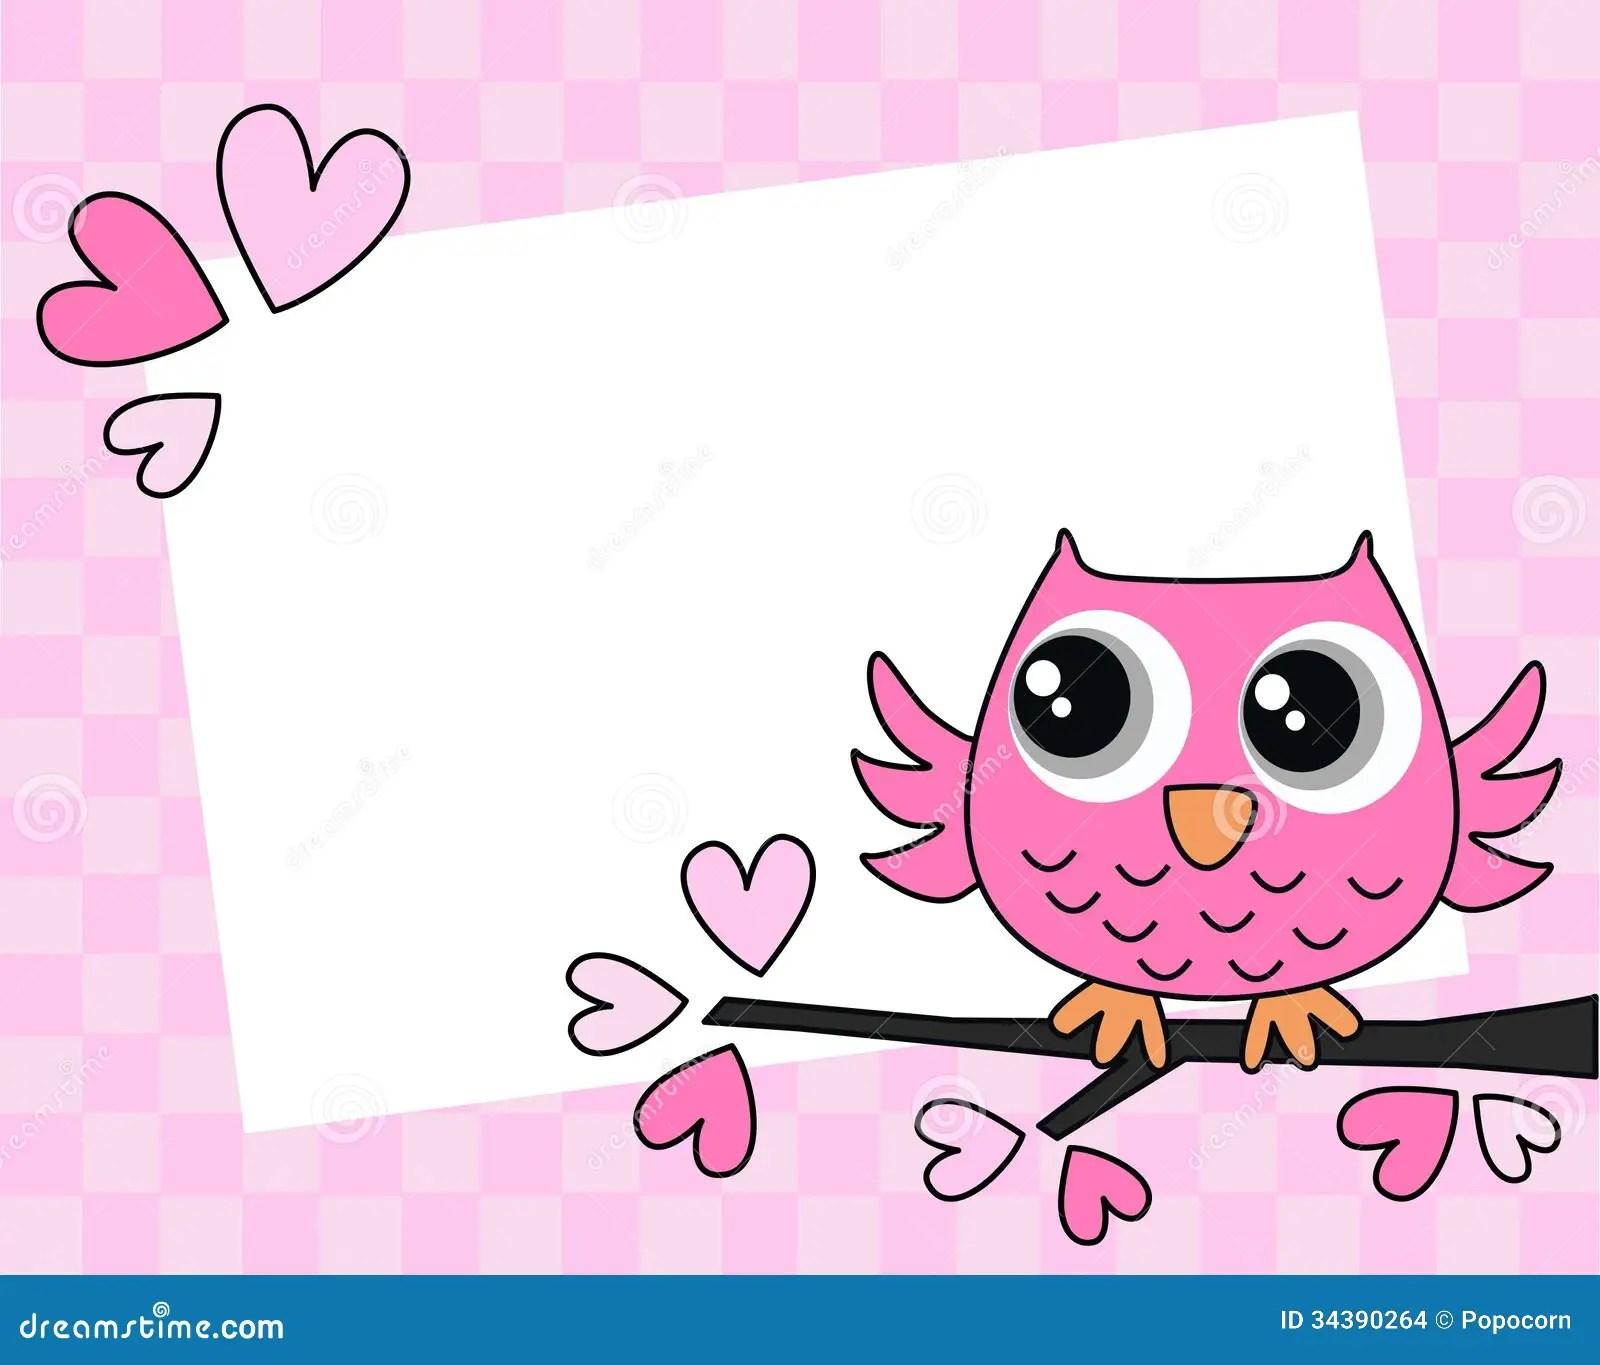 Wise As An Owl Clip Art